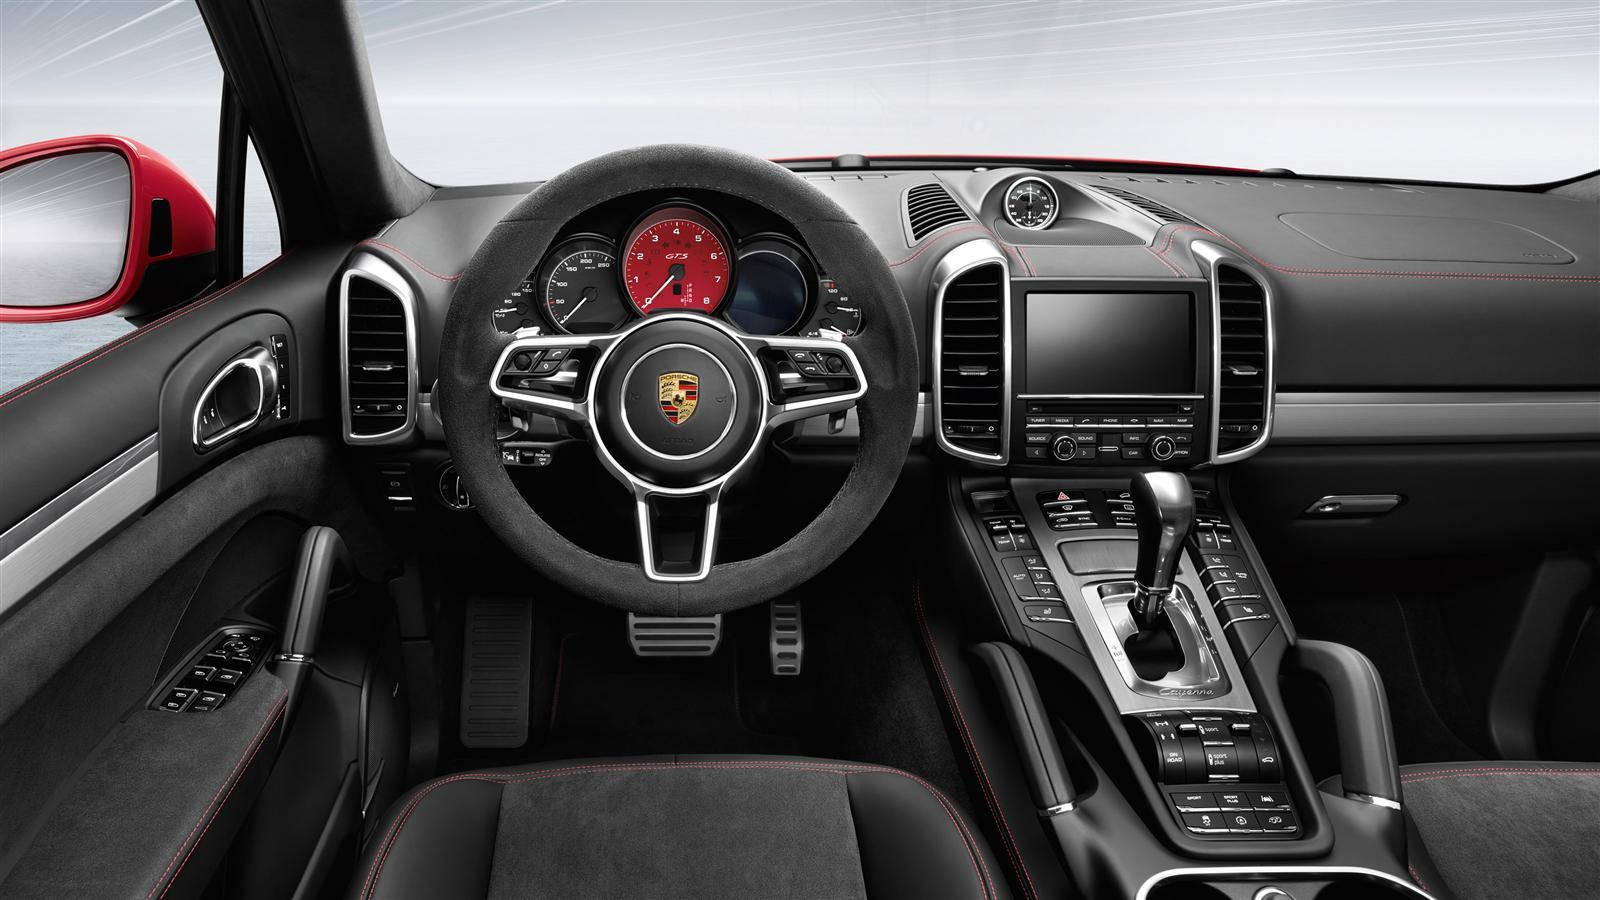 Porsche Cayenne GTS Gallery Amp Downloads Porsche Cars